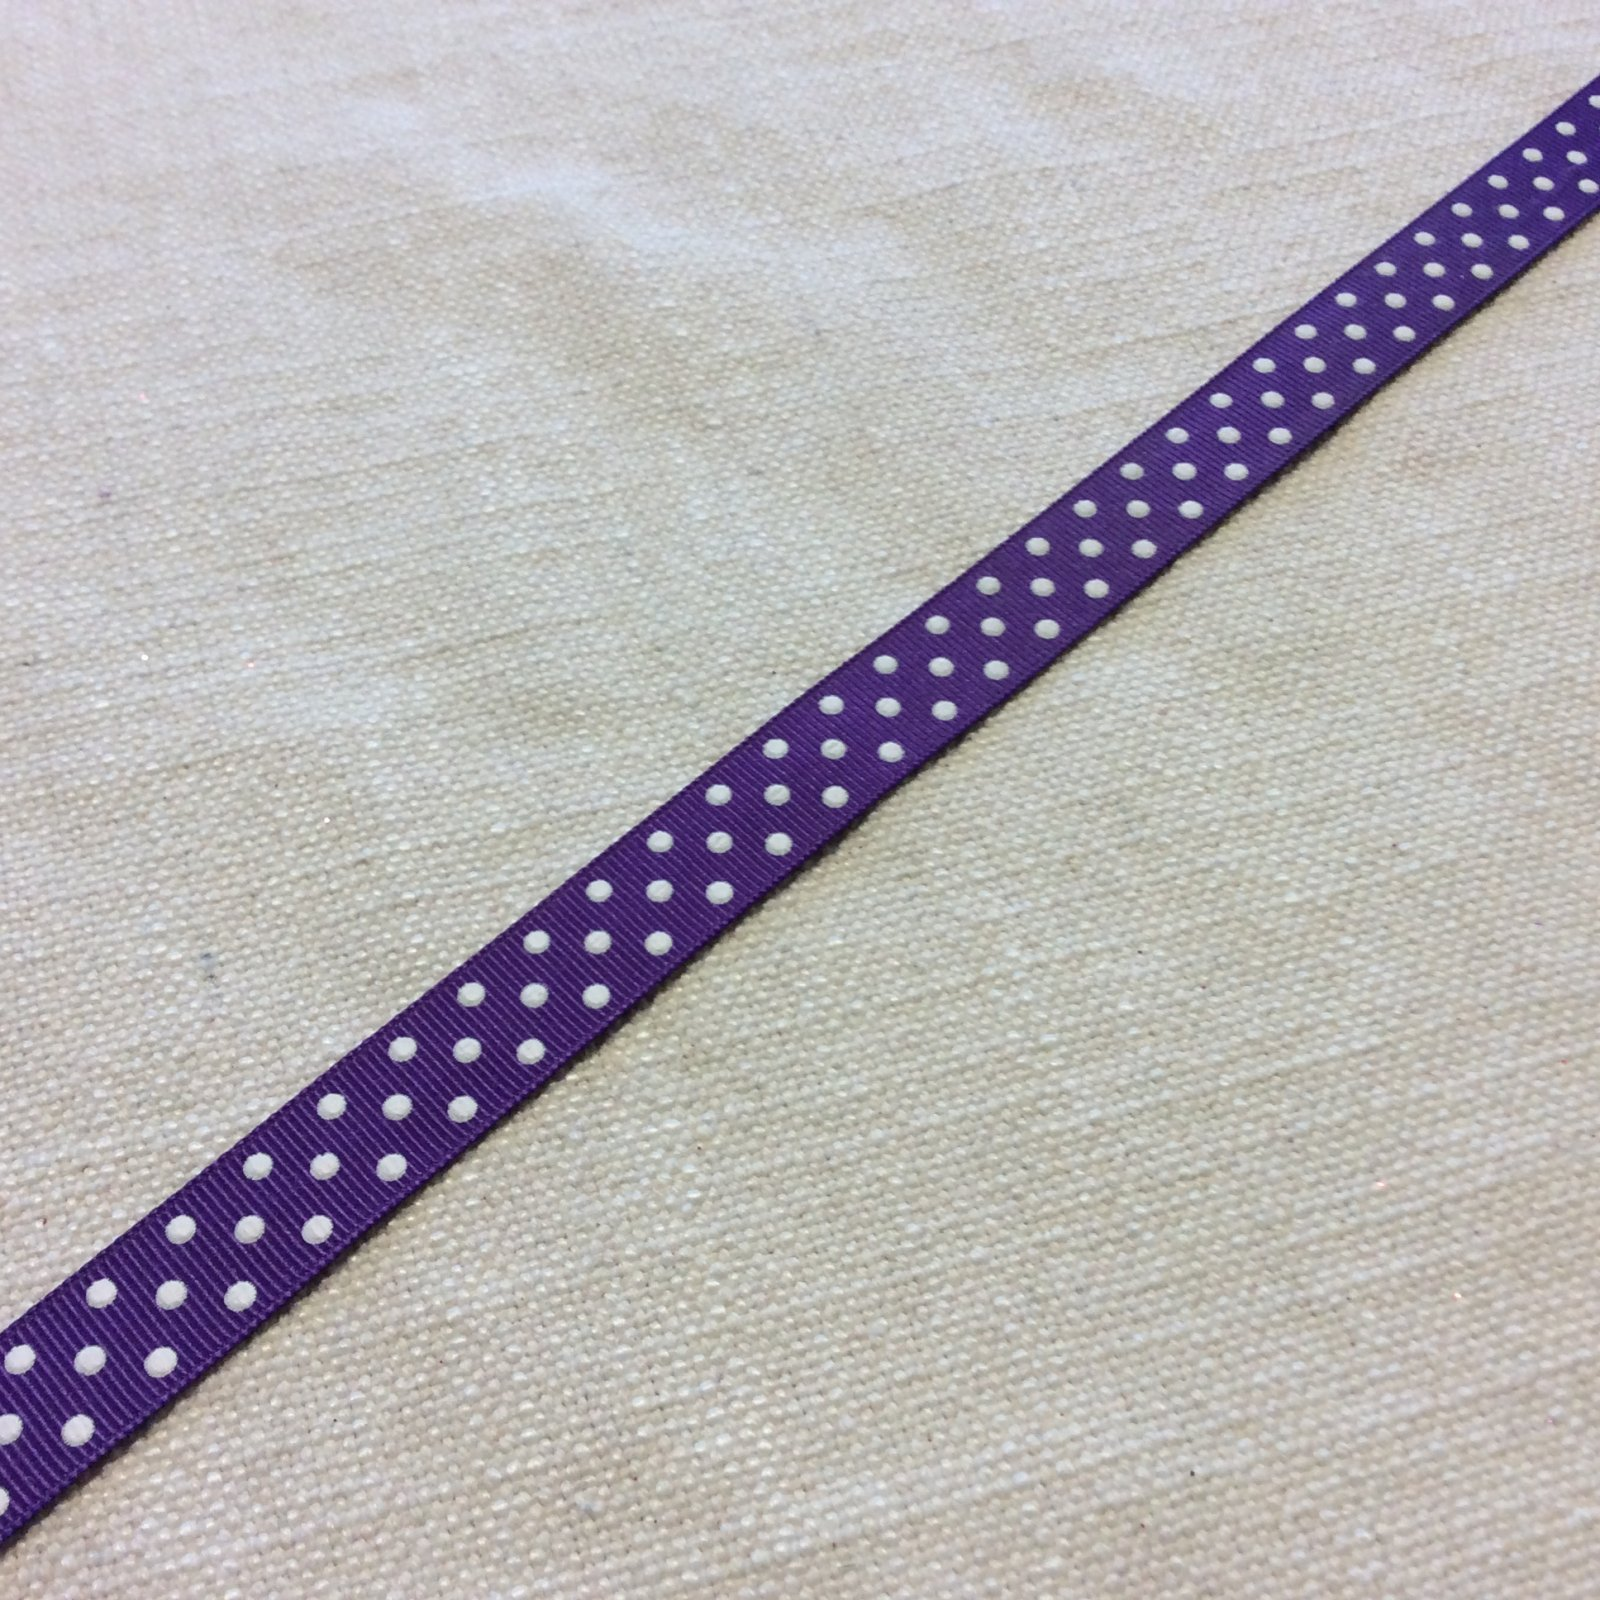 Grosgrain Ribbon 5/8 Printed Purple and White Polka Dot Trim Ribbon RIB1161